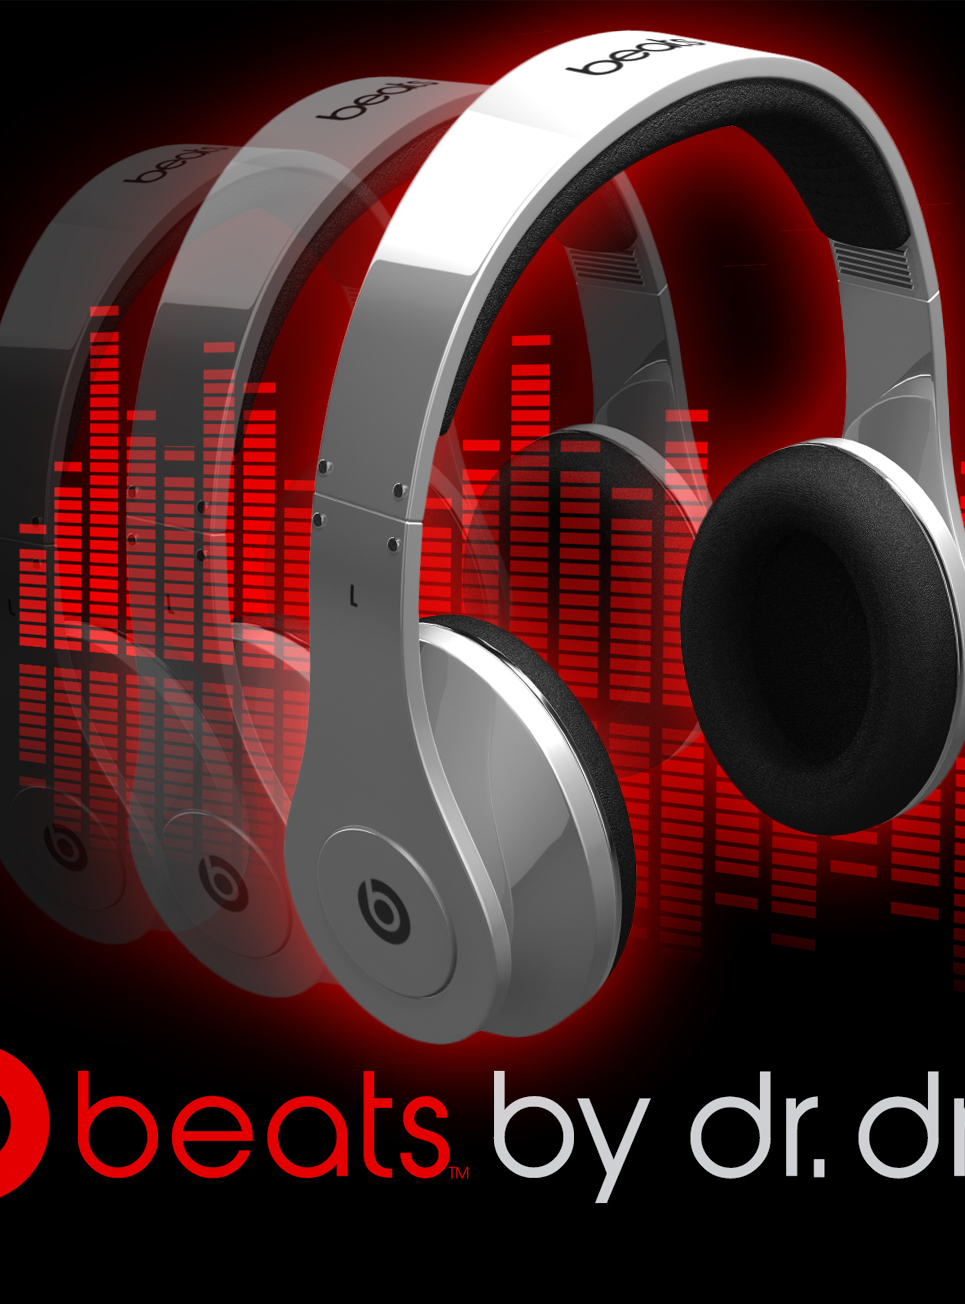 Beats show